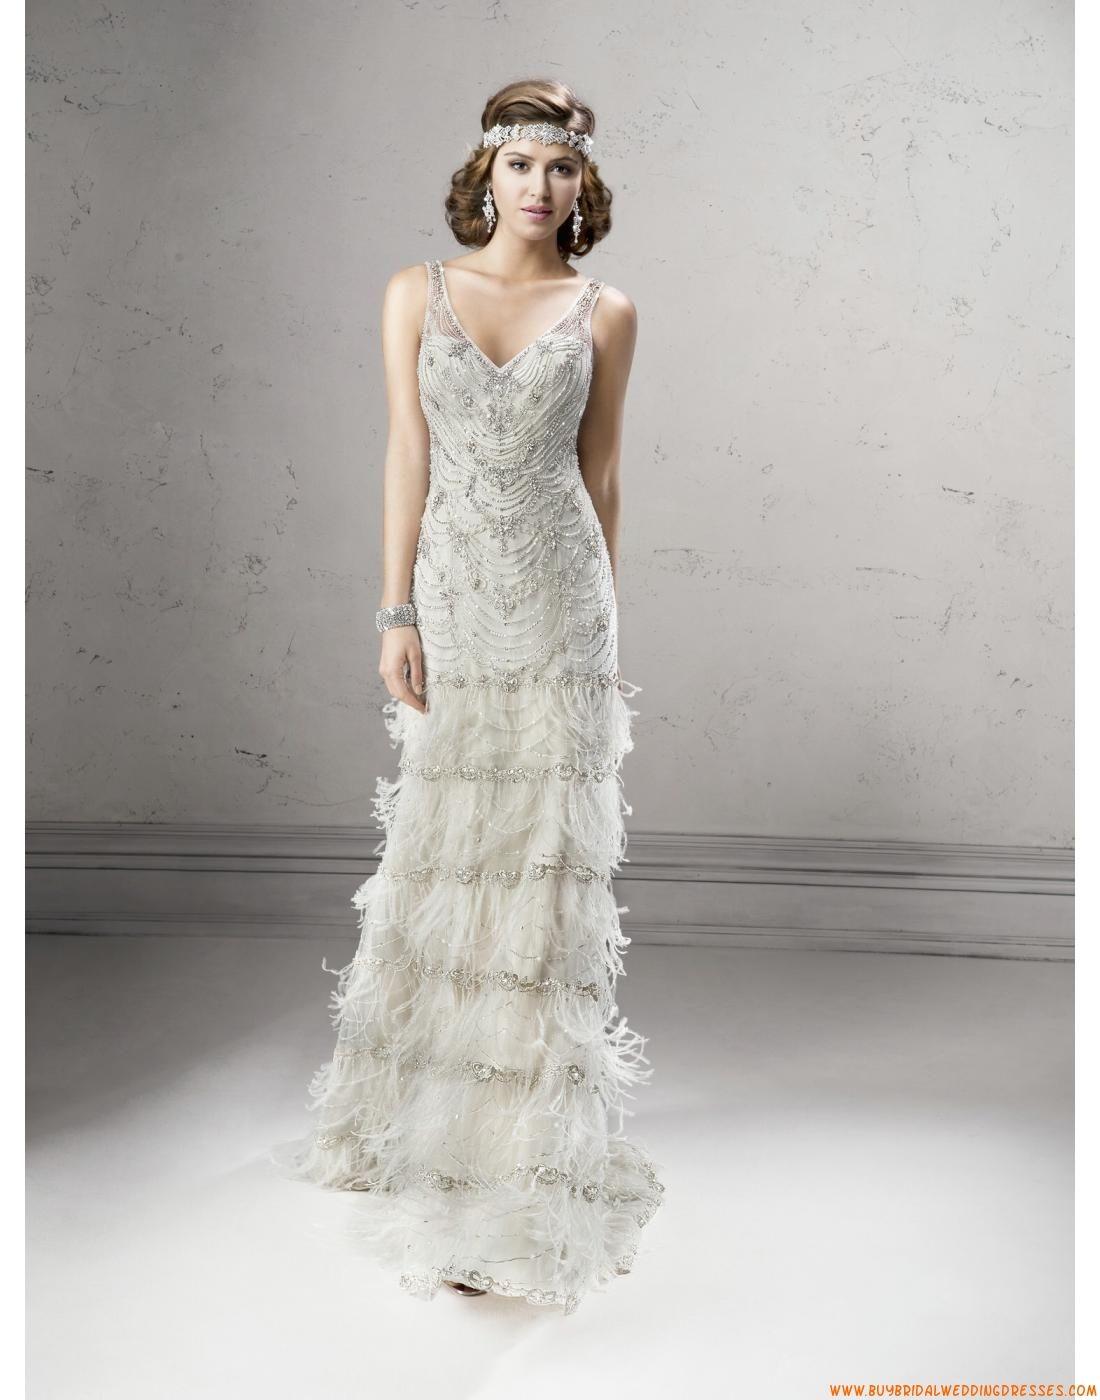 Sottero u midgley wedding dresses style shauna st halloween